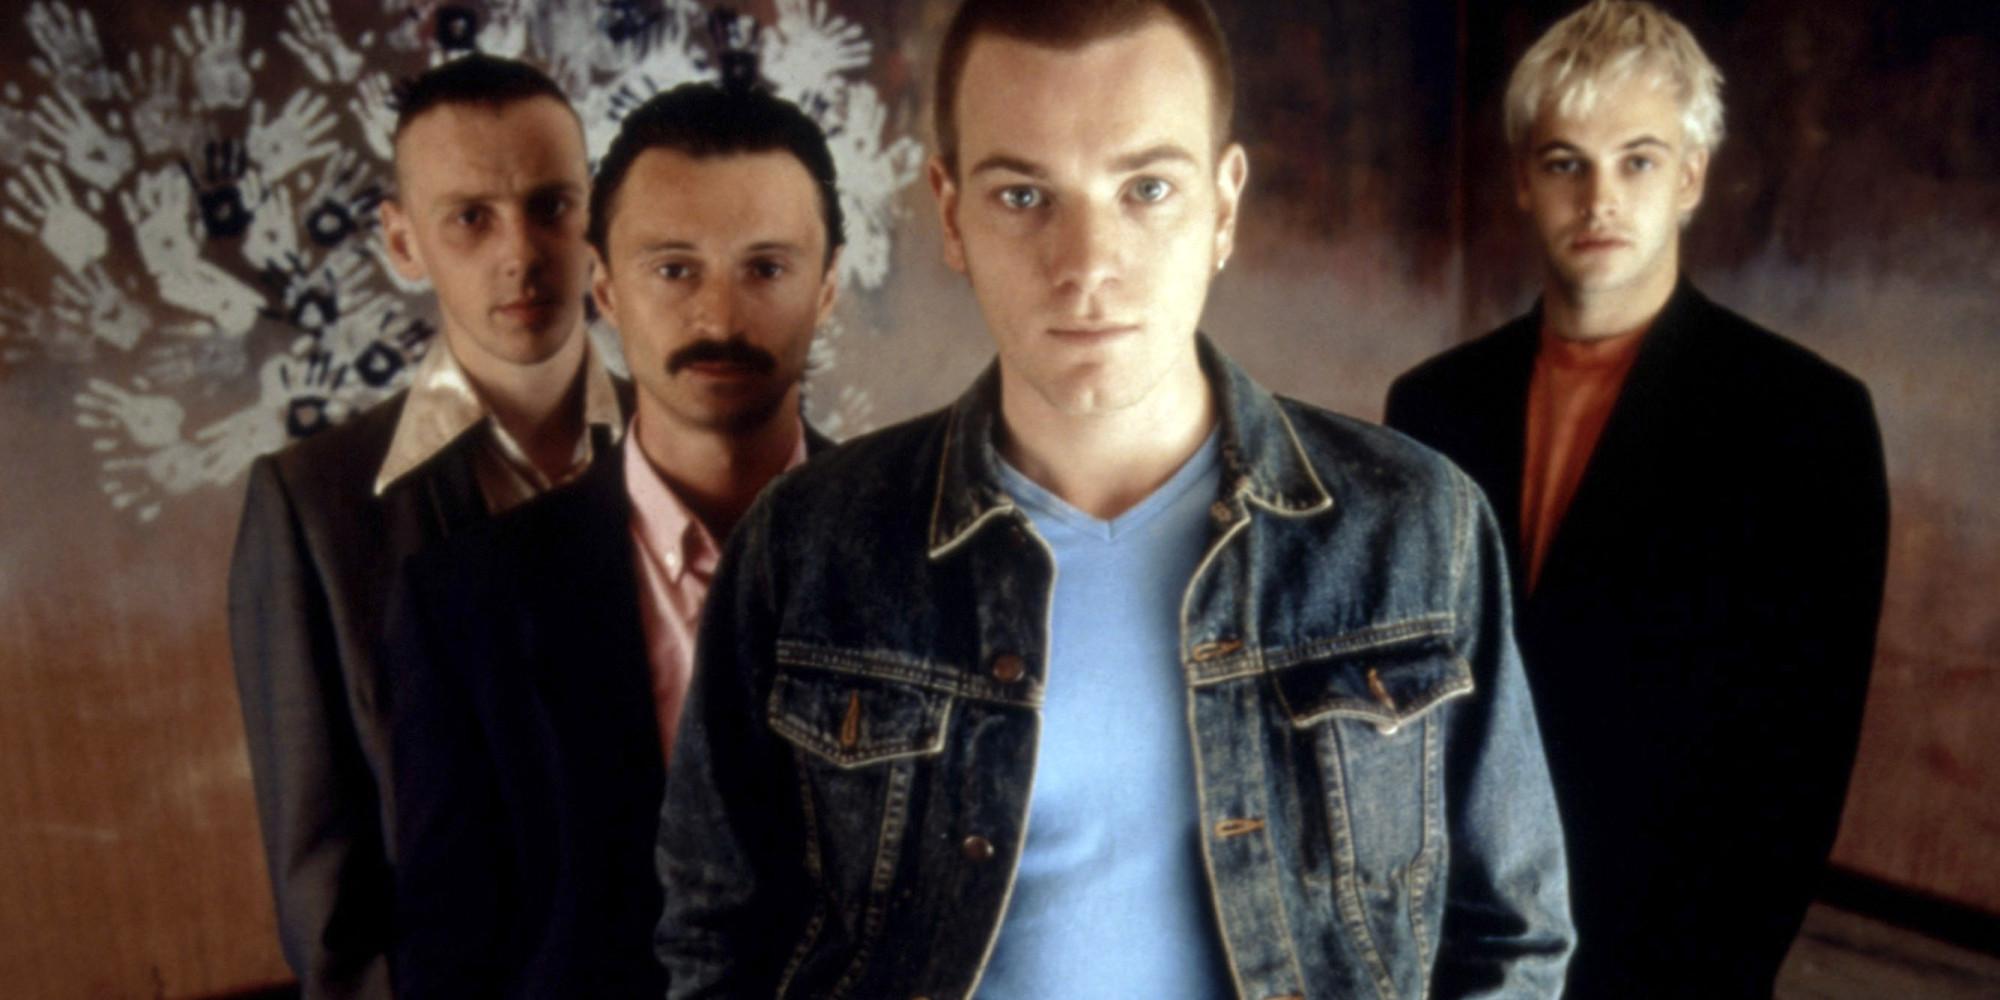 'Trainspotting' Film - 1996